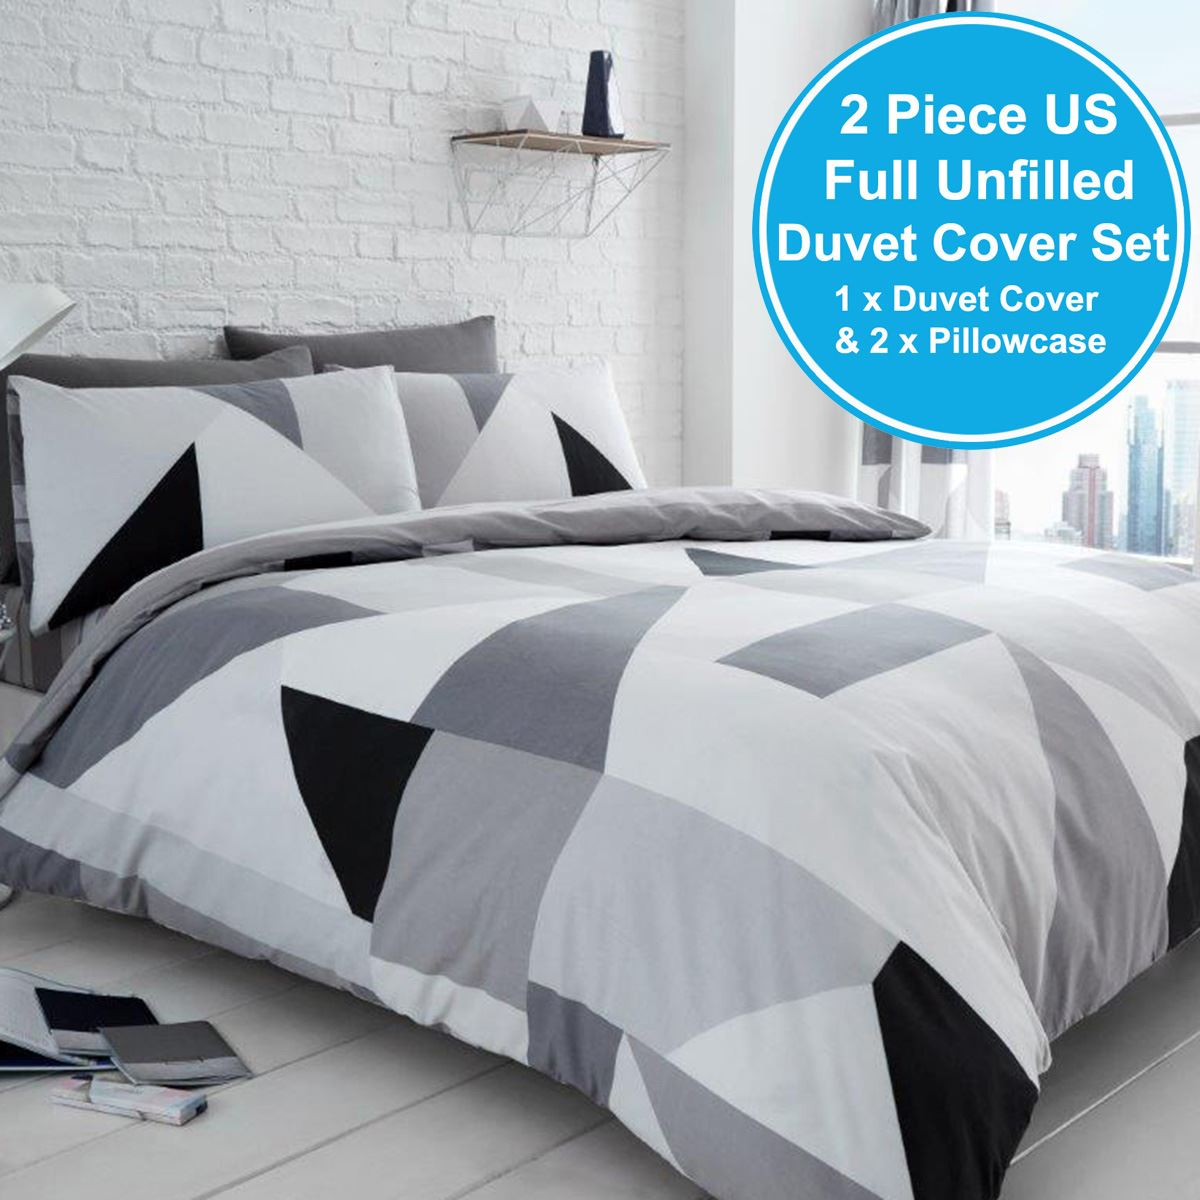 SYDNEY GEOMETRIC DOUBLE DUVET COVER SET BEDDING BLACK WHITE GREY